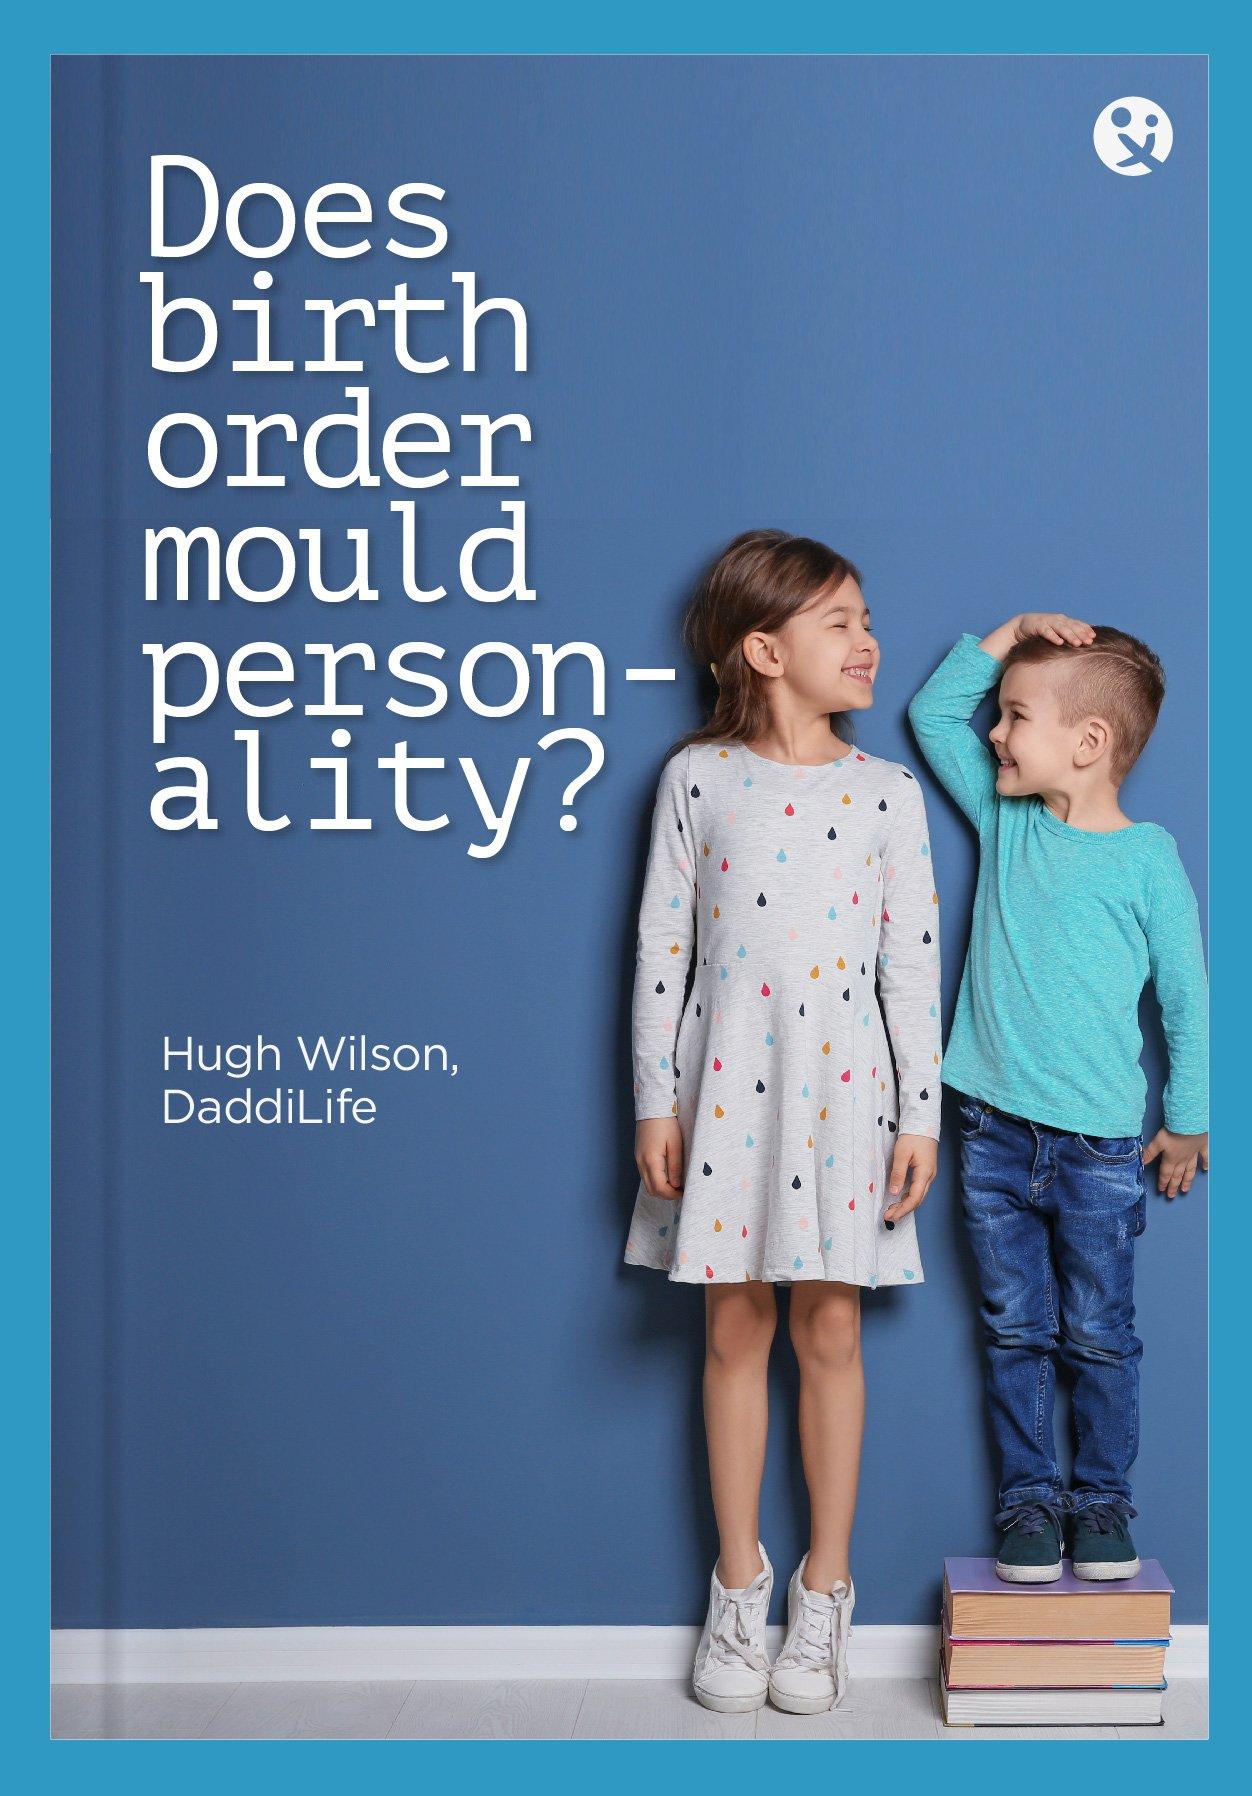 birth order, personality, siblings